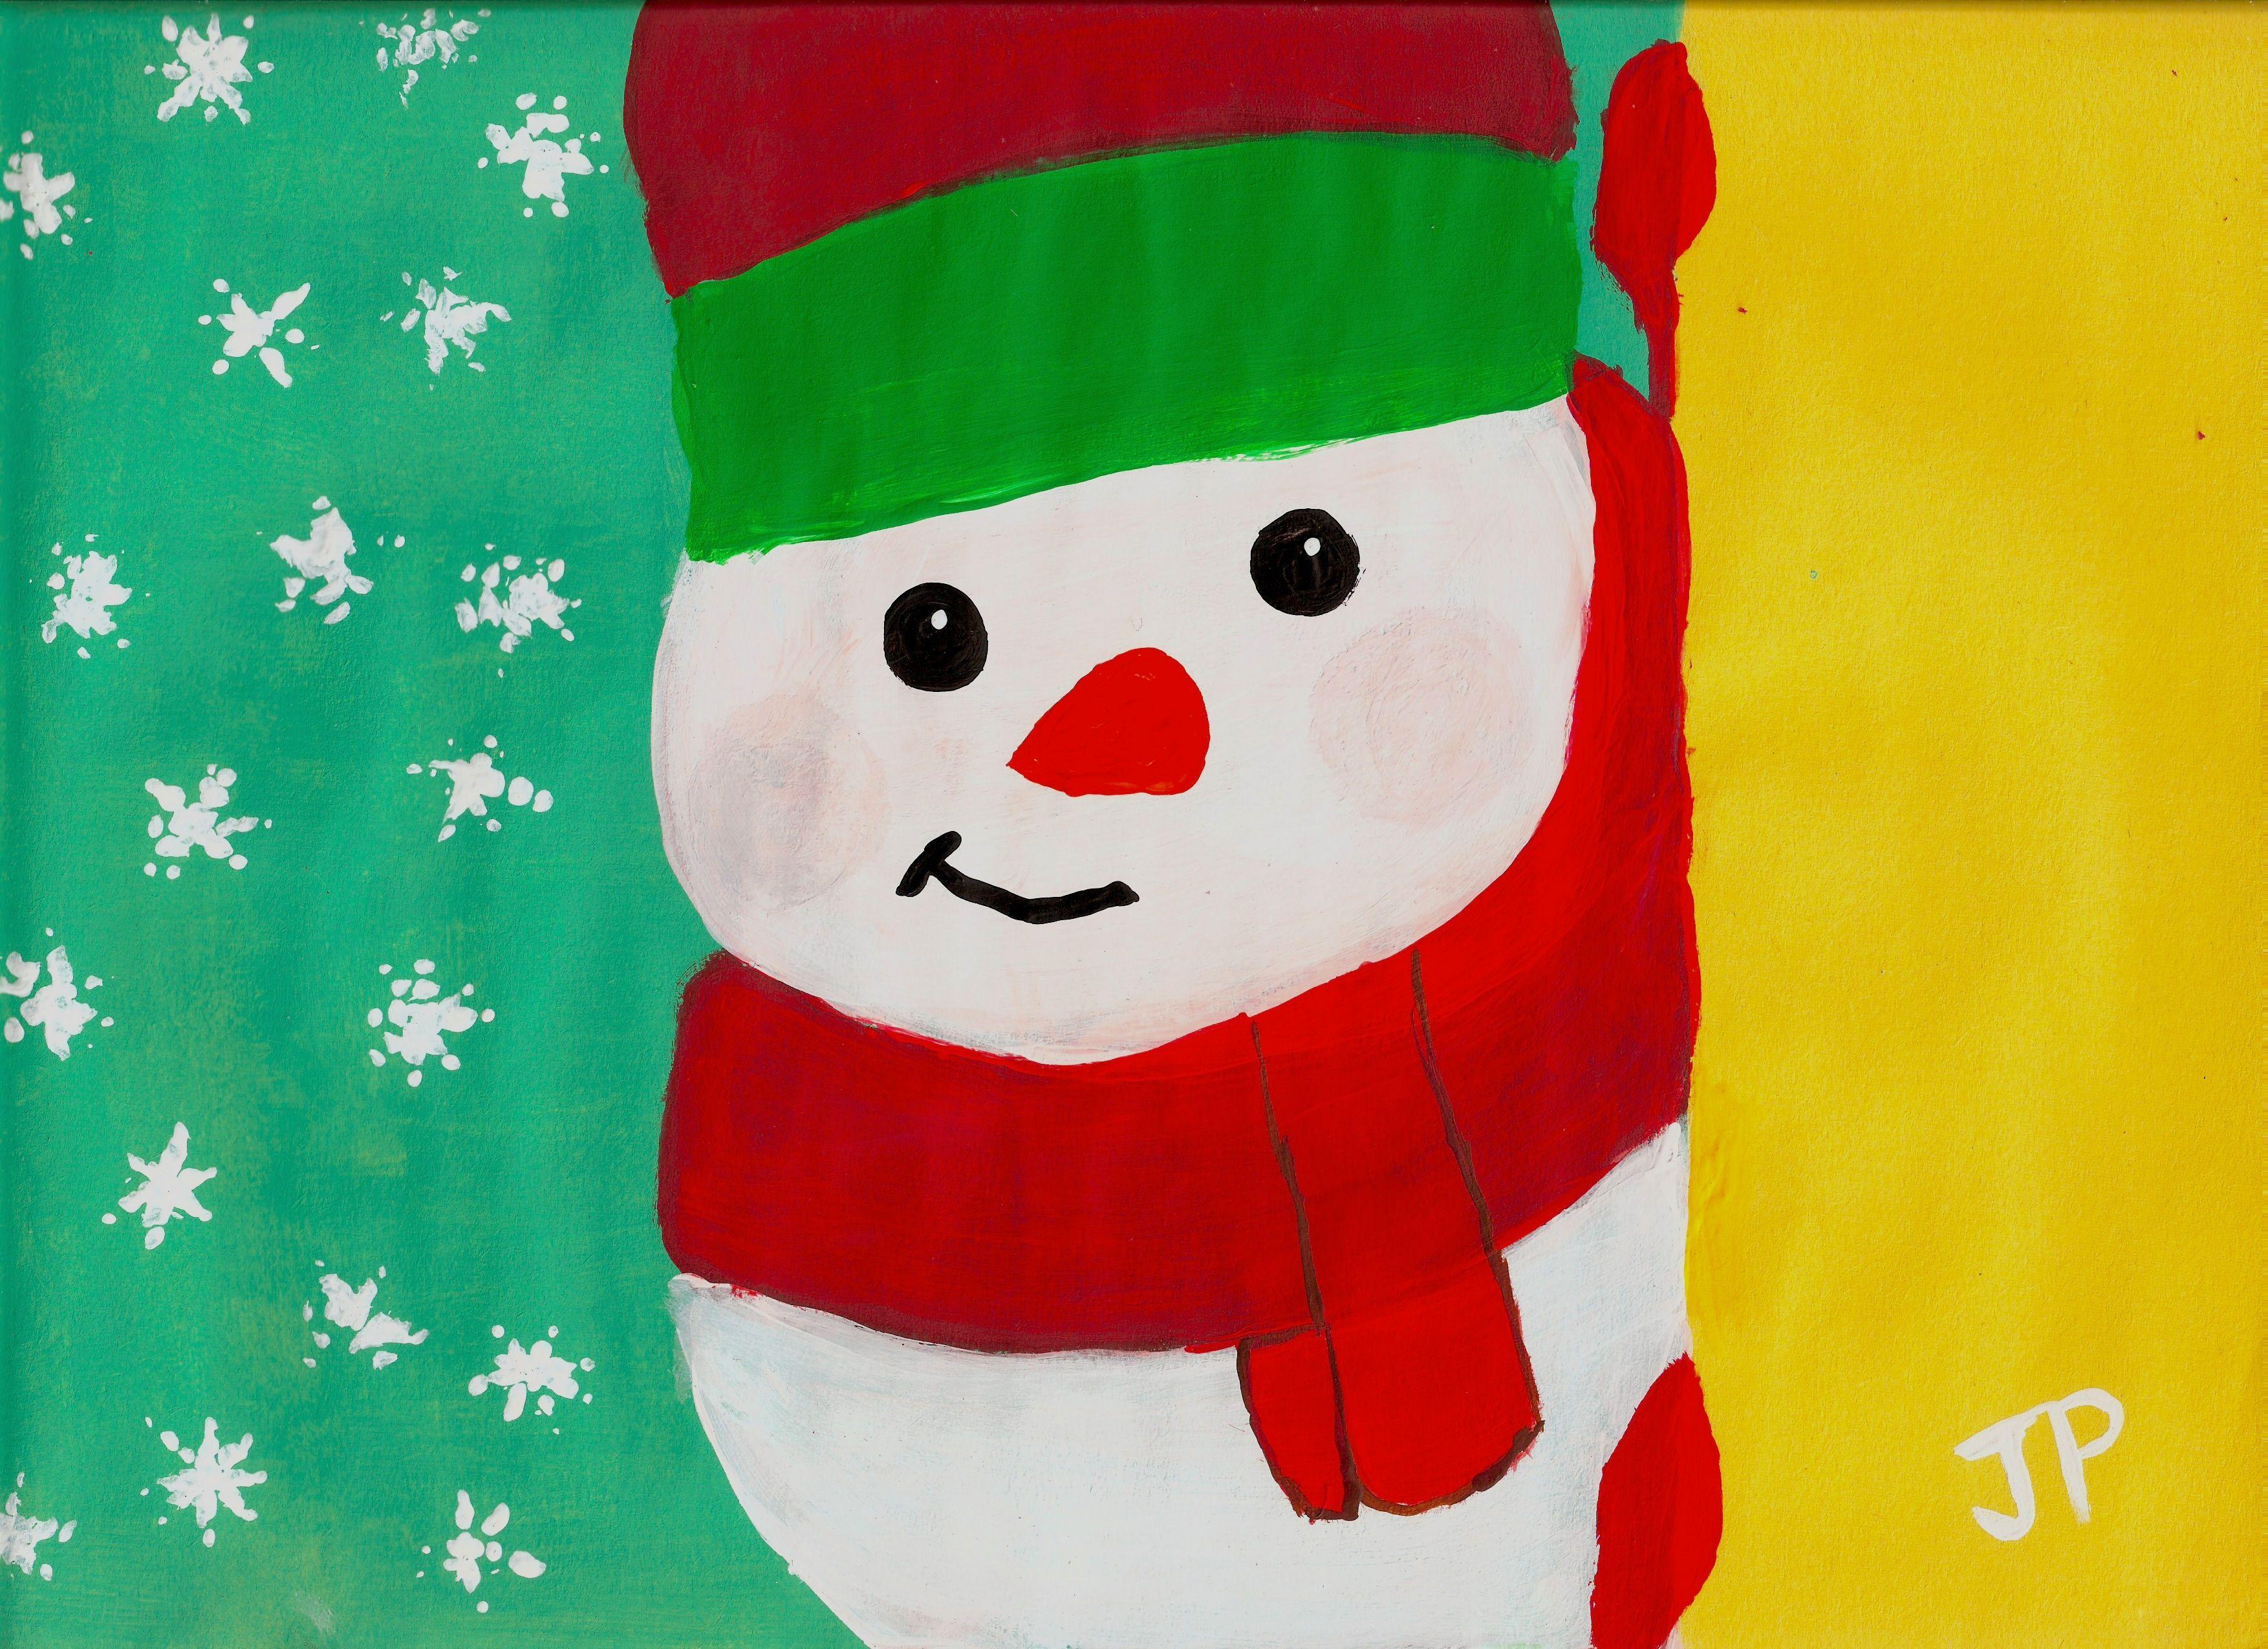 Sly Snowman